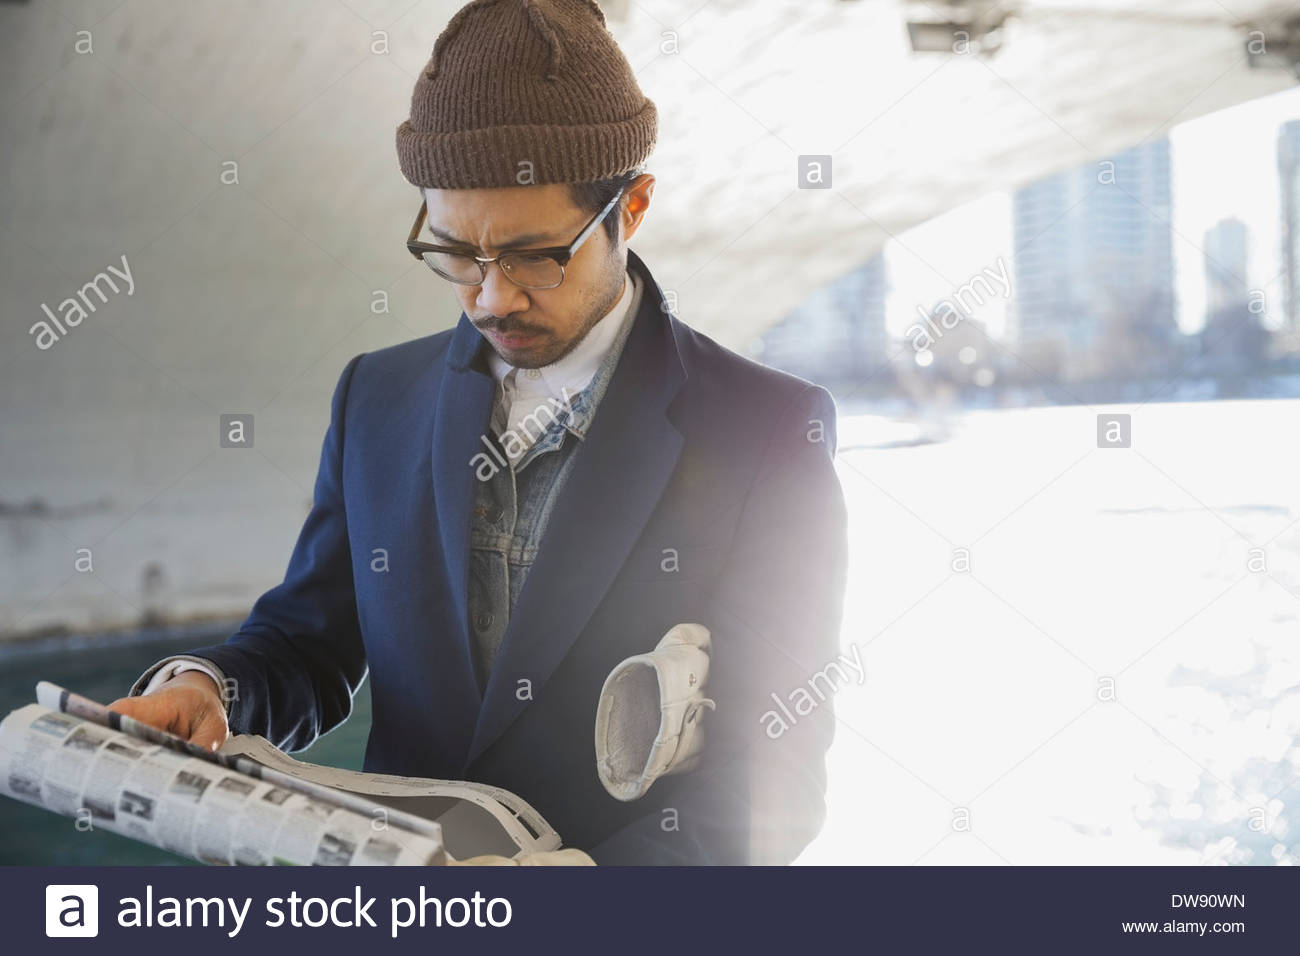 Man reading newspaper under bridge - Stock Image